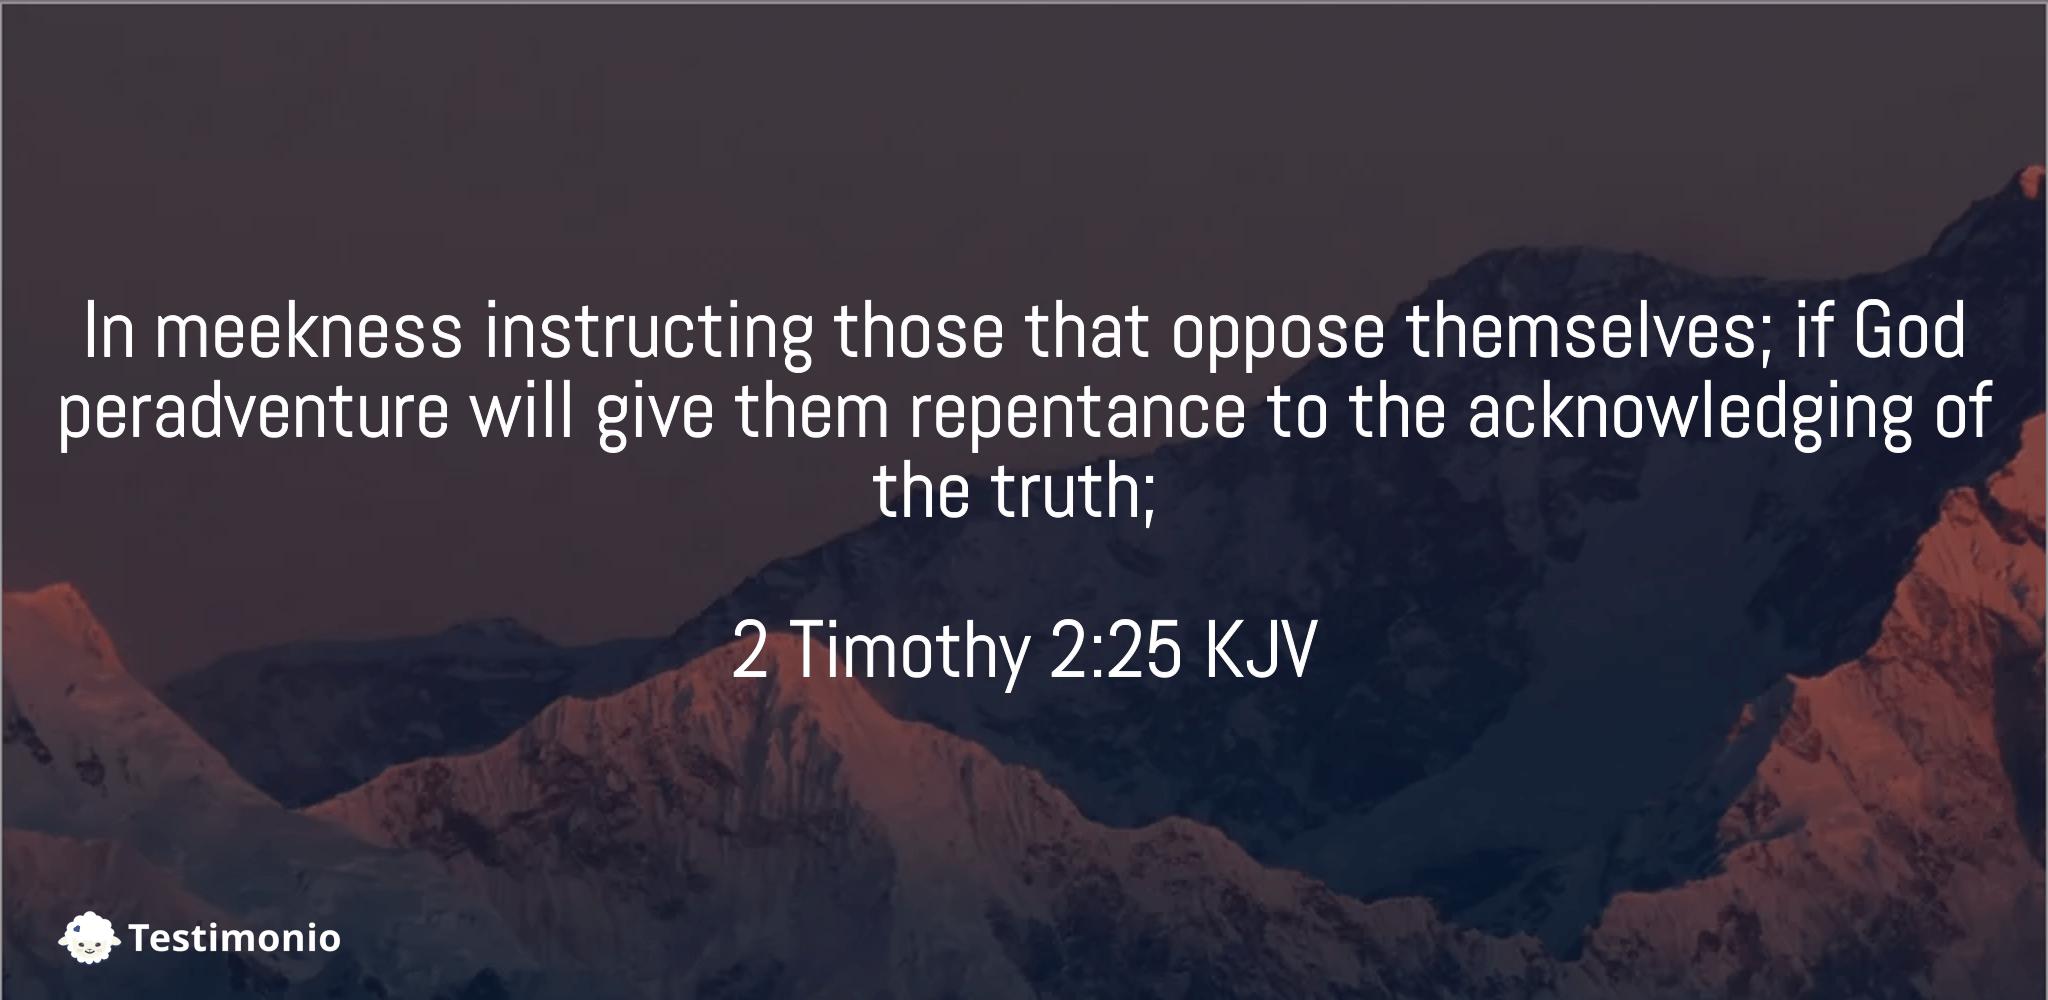 2 Timothy 2:25